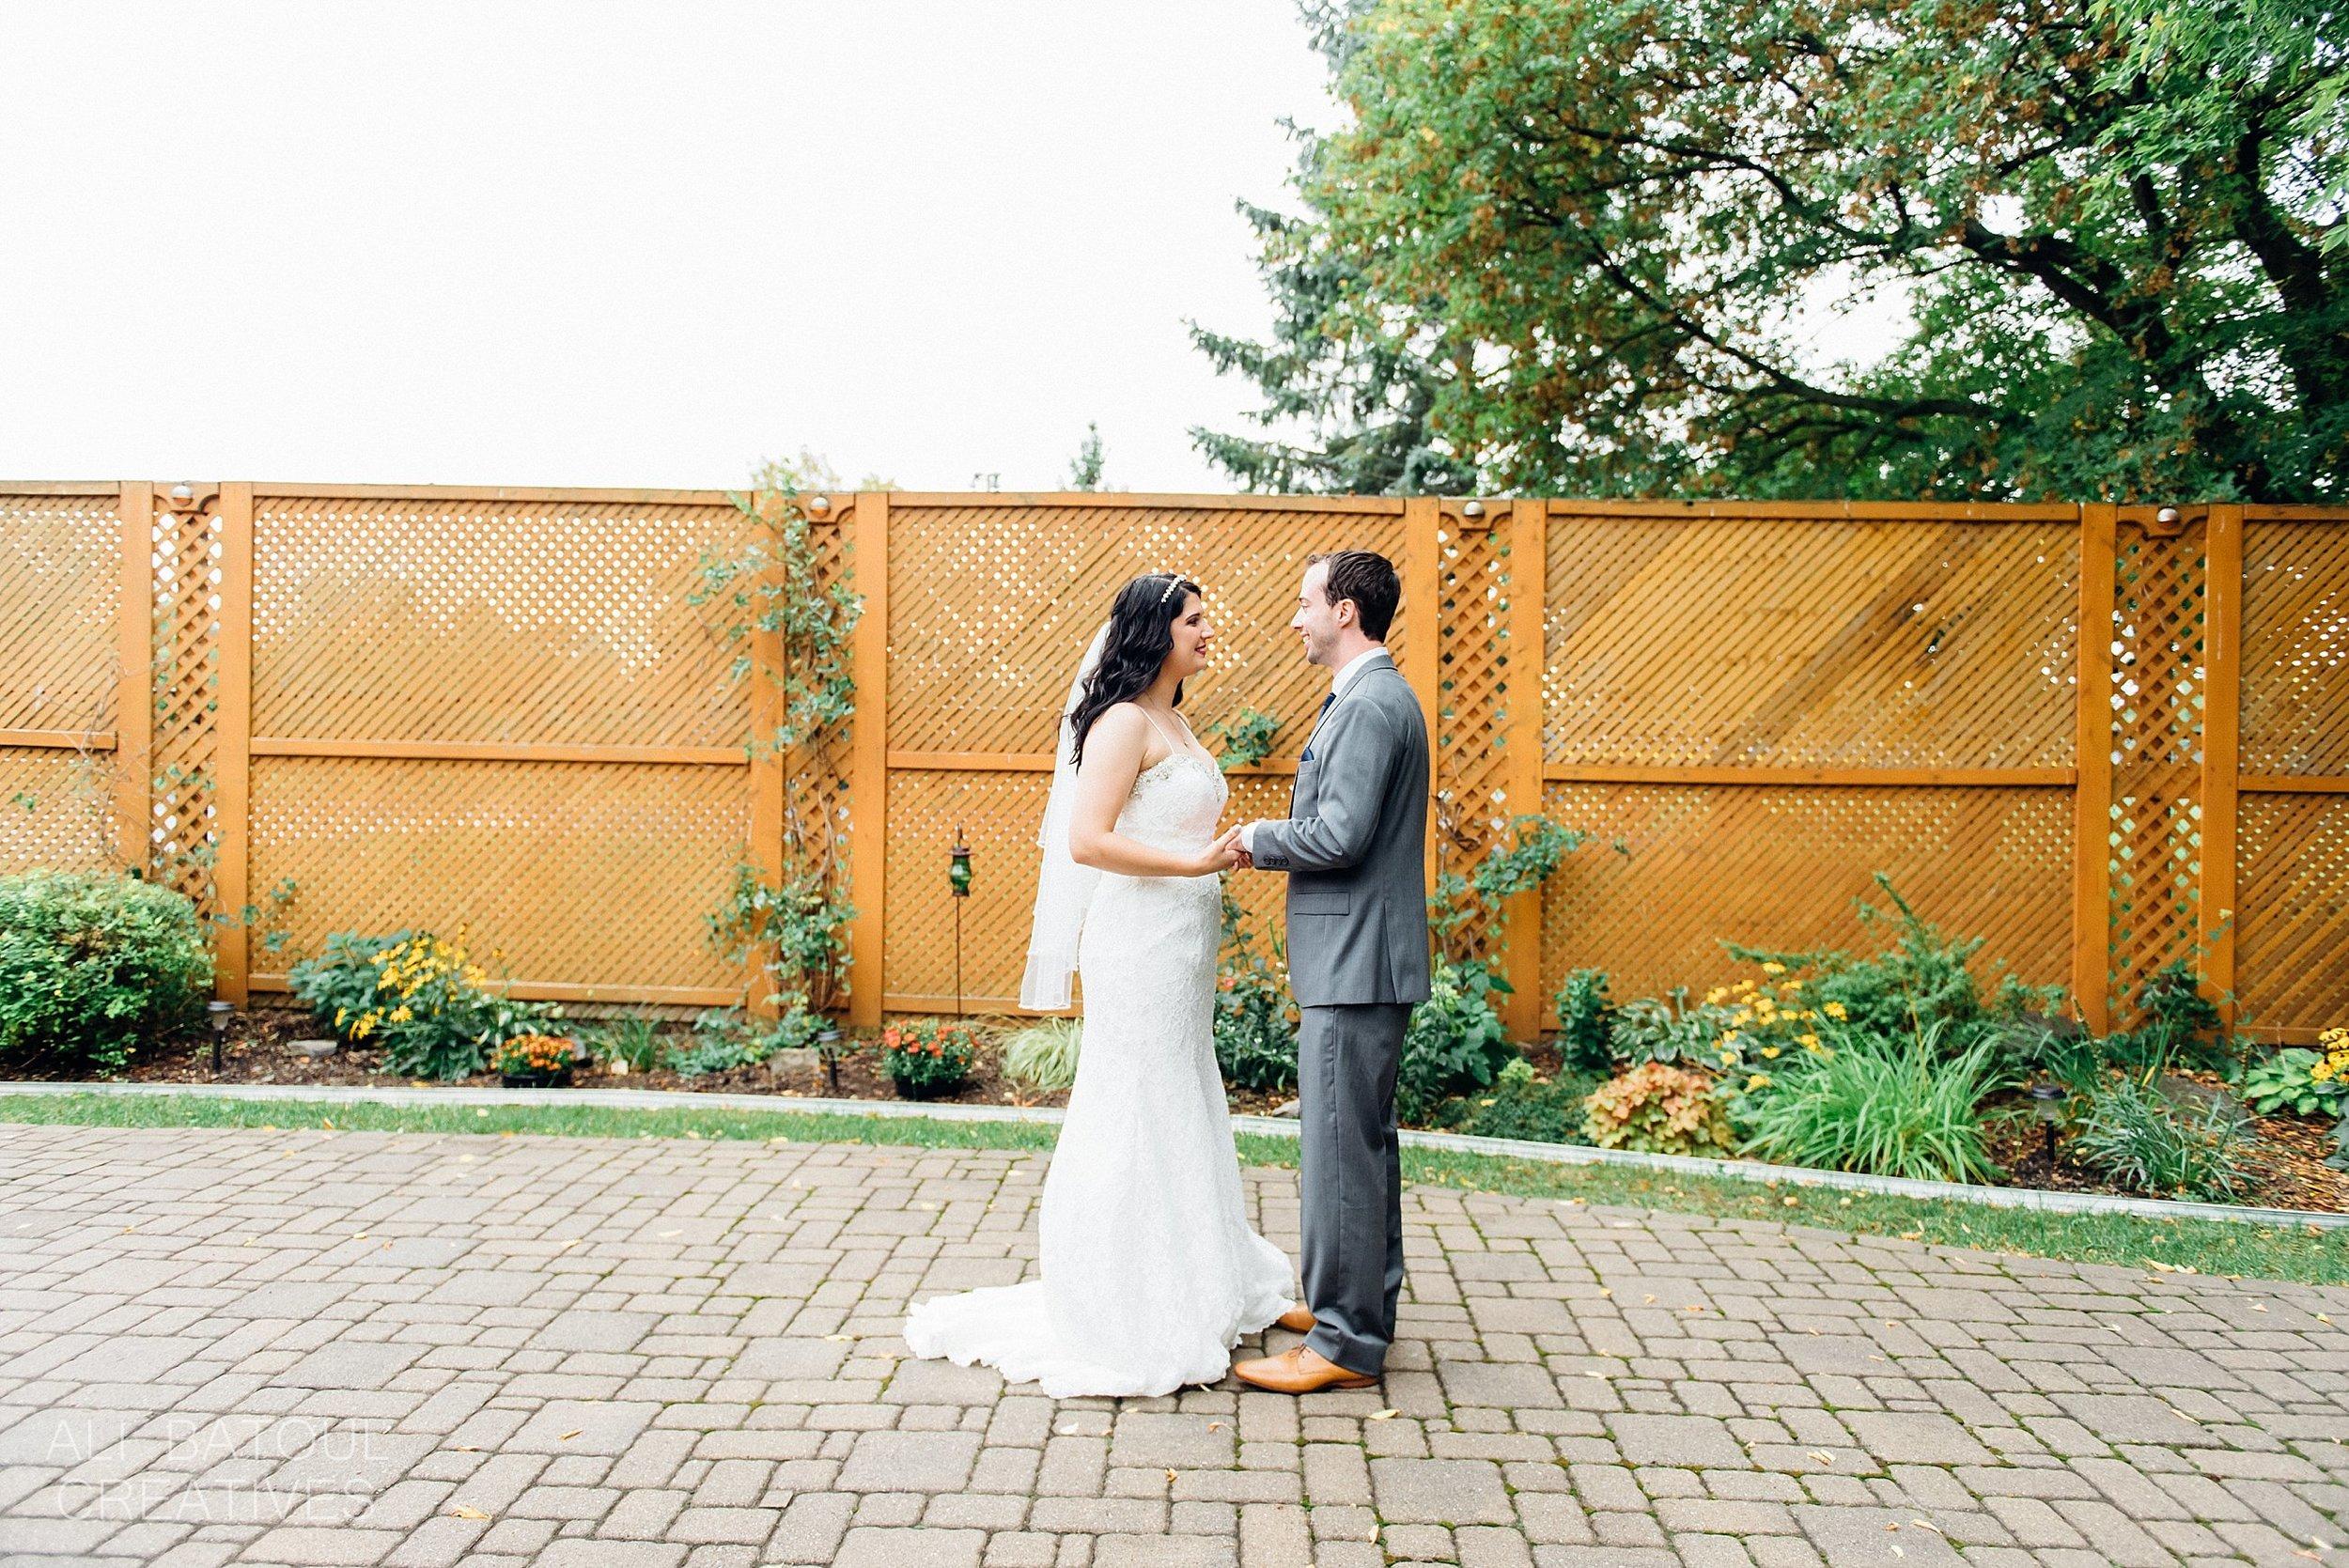 Jocelyn + Steve At The Schoolhouse Wedding - Ali and Batoul Fine Art Wedding Photography_0030.jpg